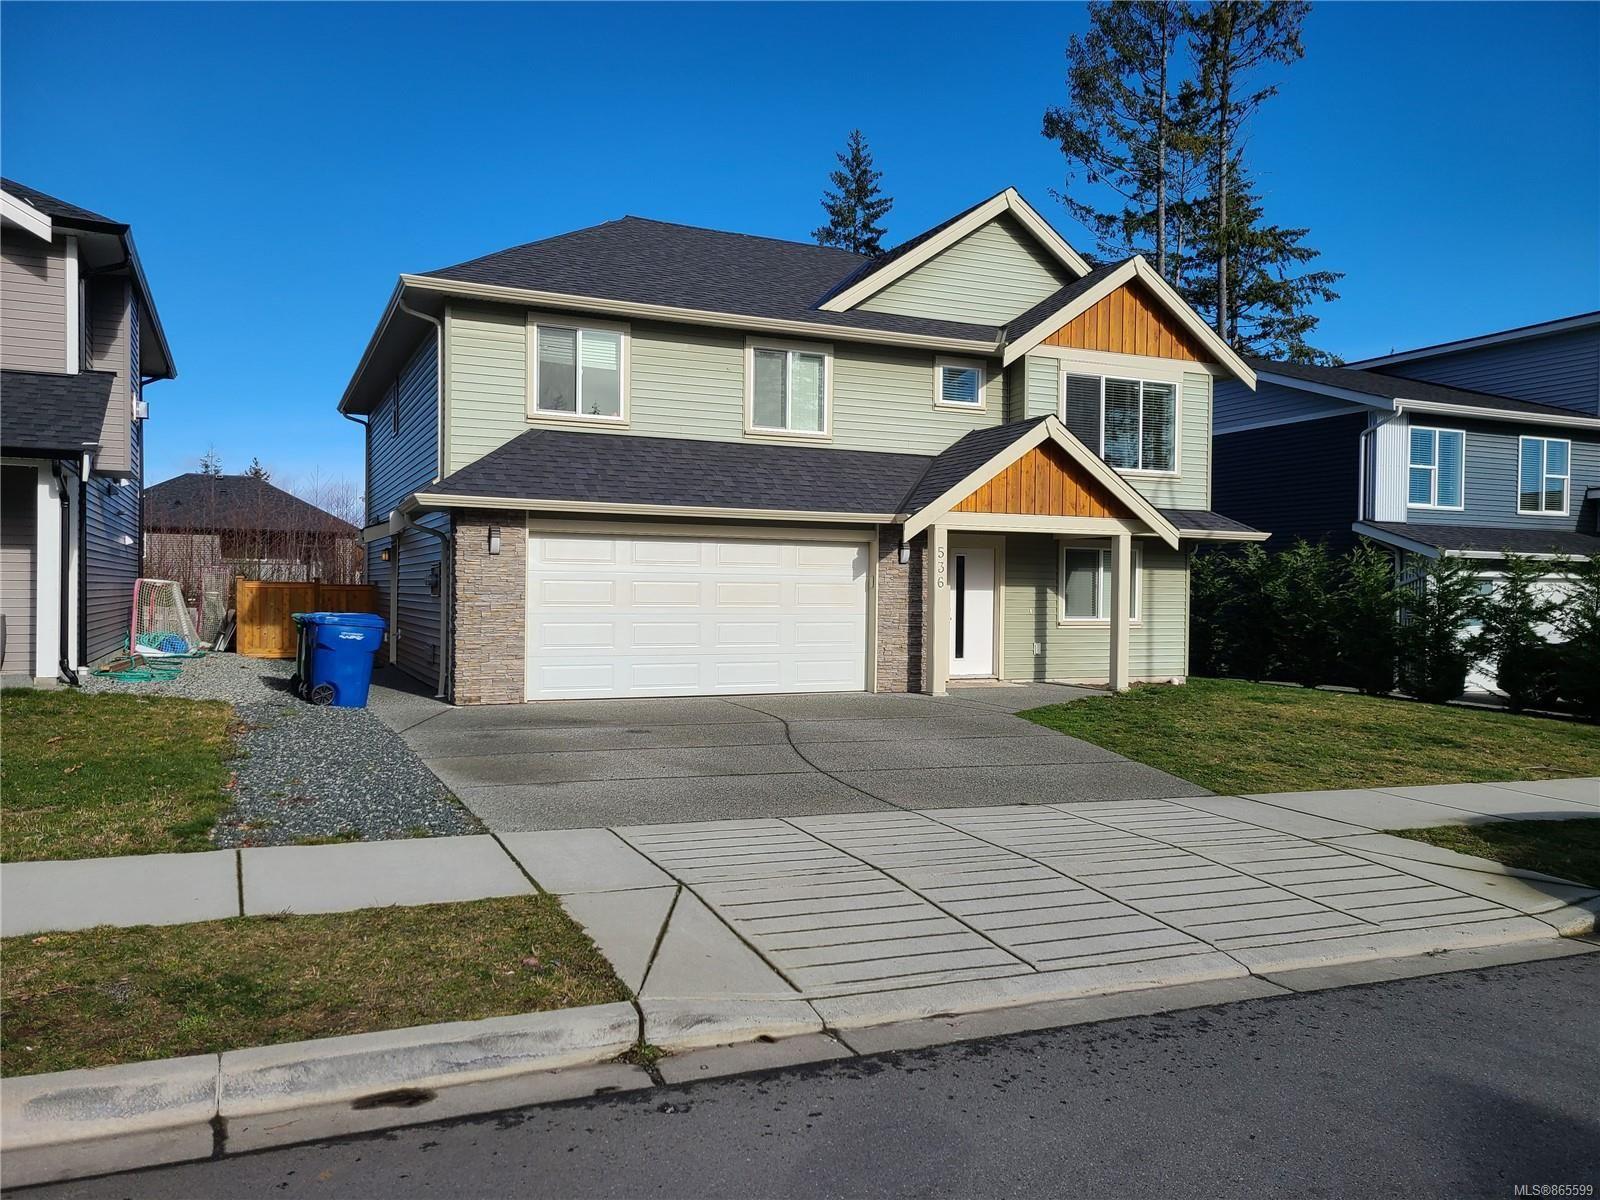 Main Photo: 536 Lori Pl in : Na South Nanaimo House for sale (Nanaimo)  : MLS®# 865599